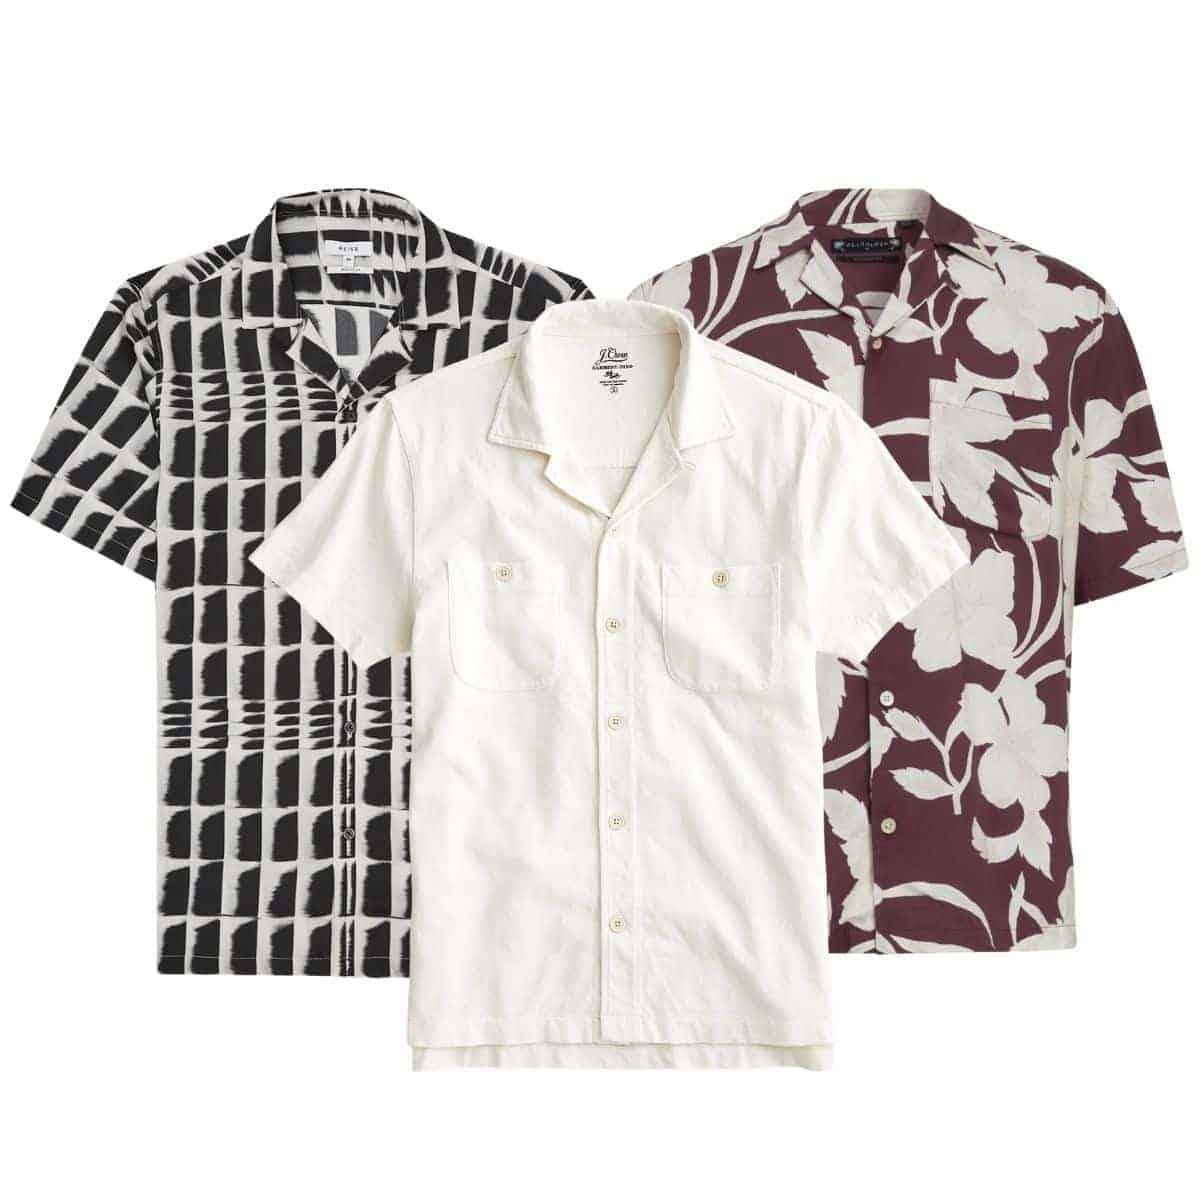 Three camp collar shirts.